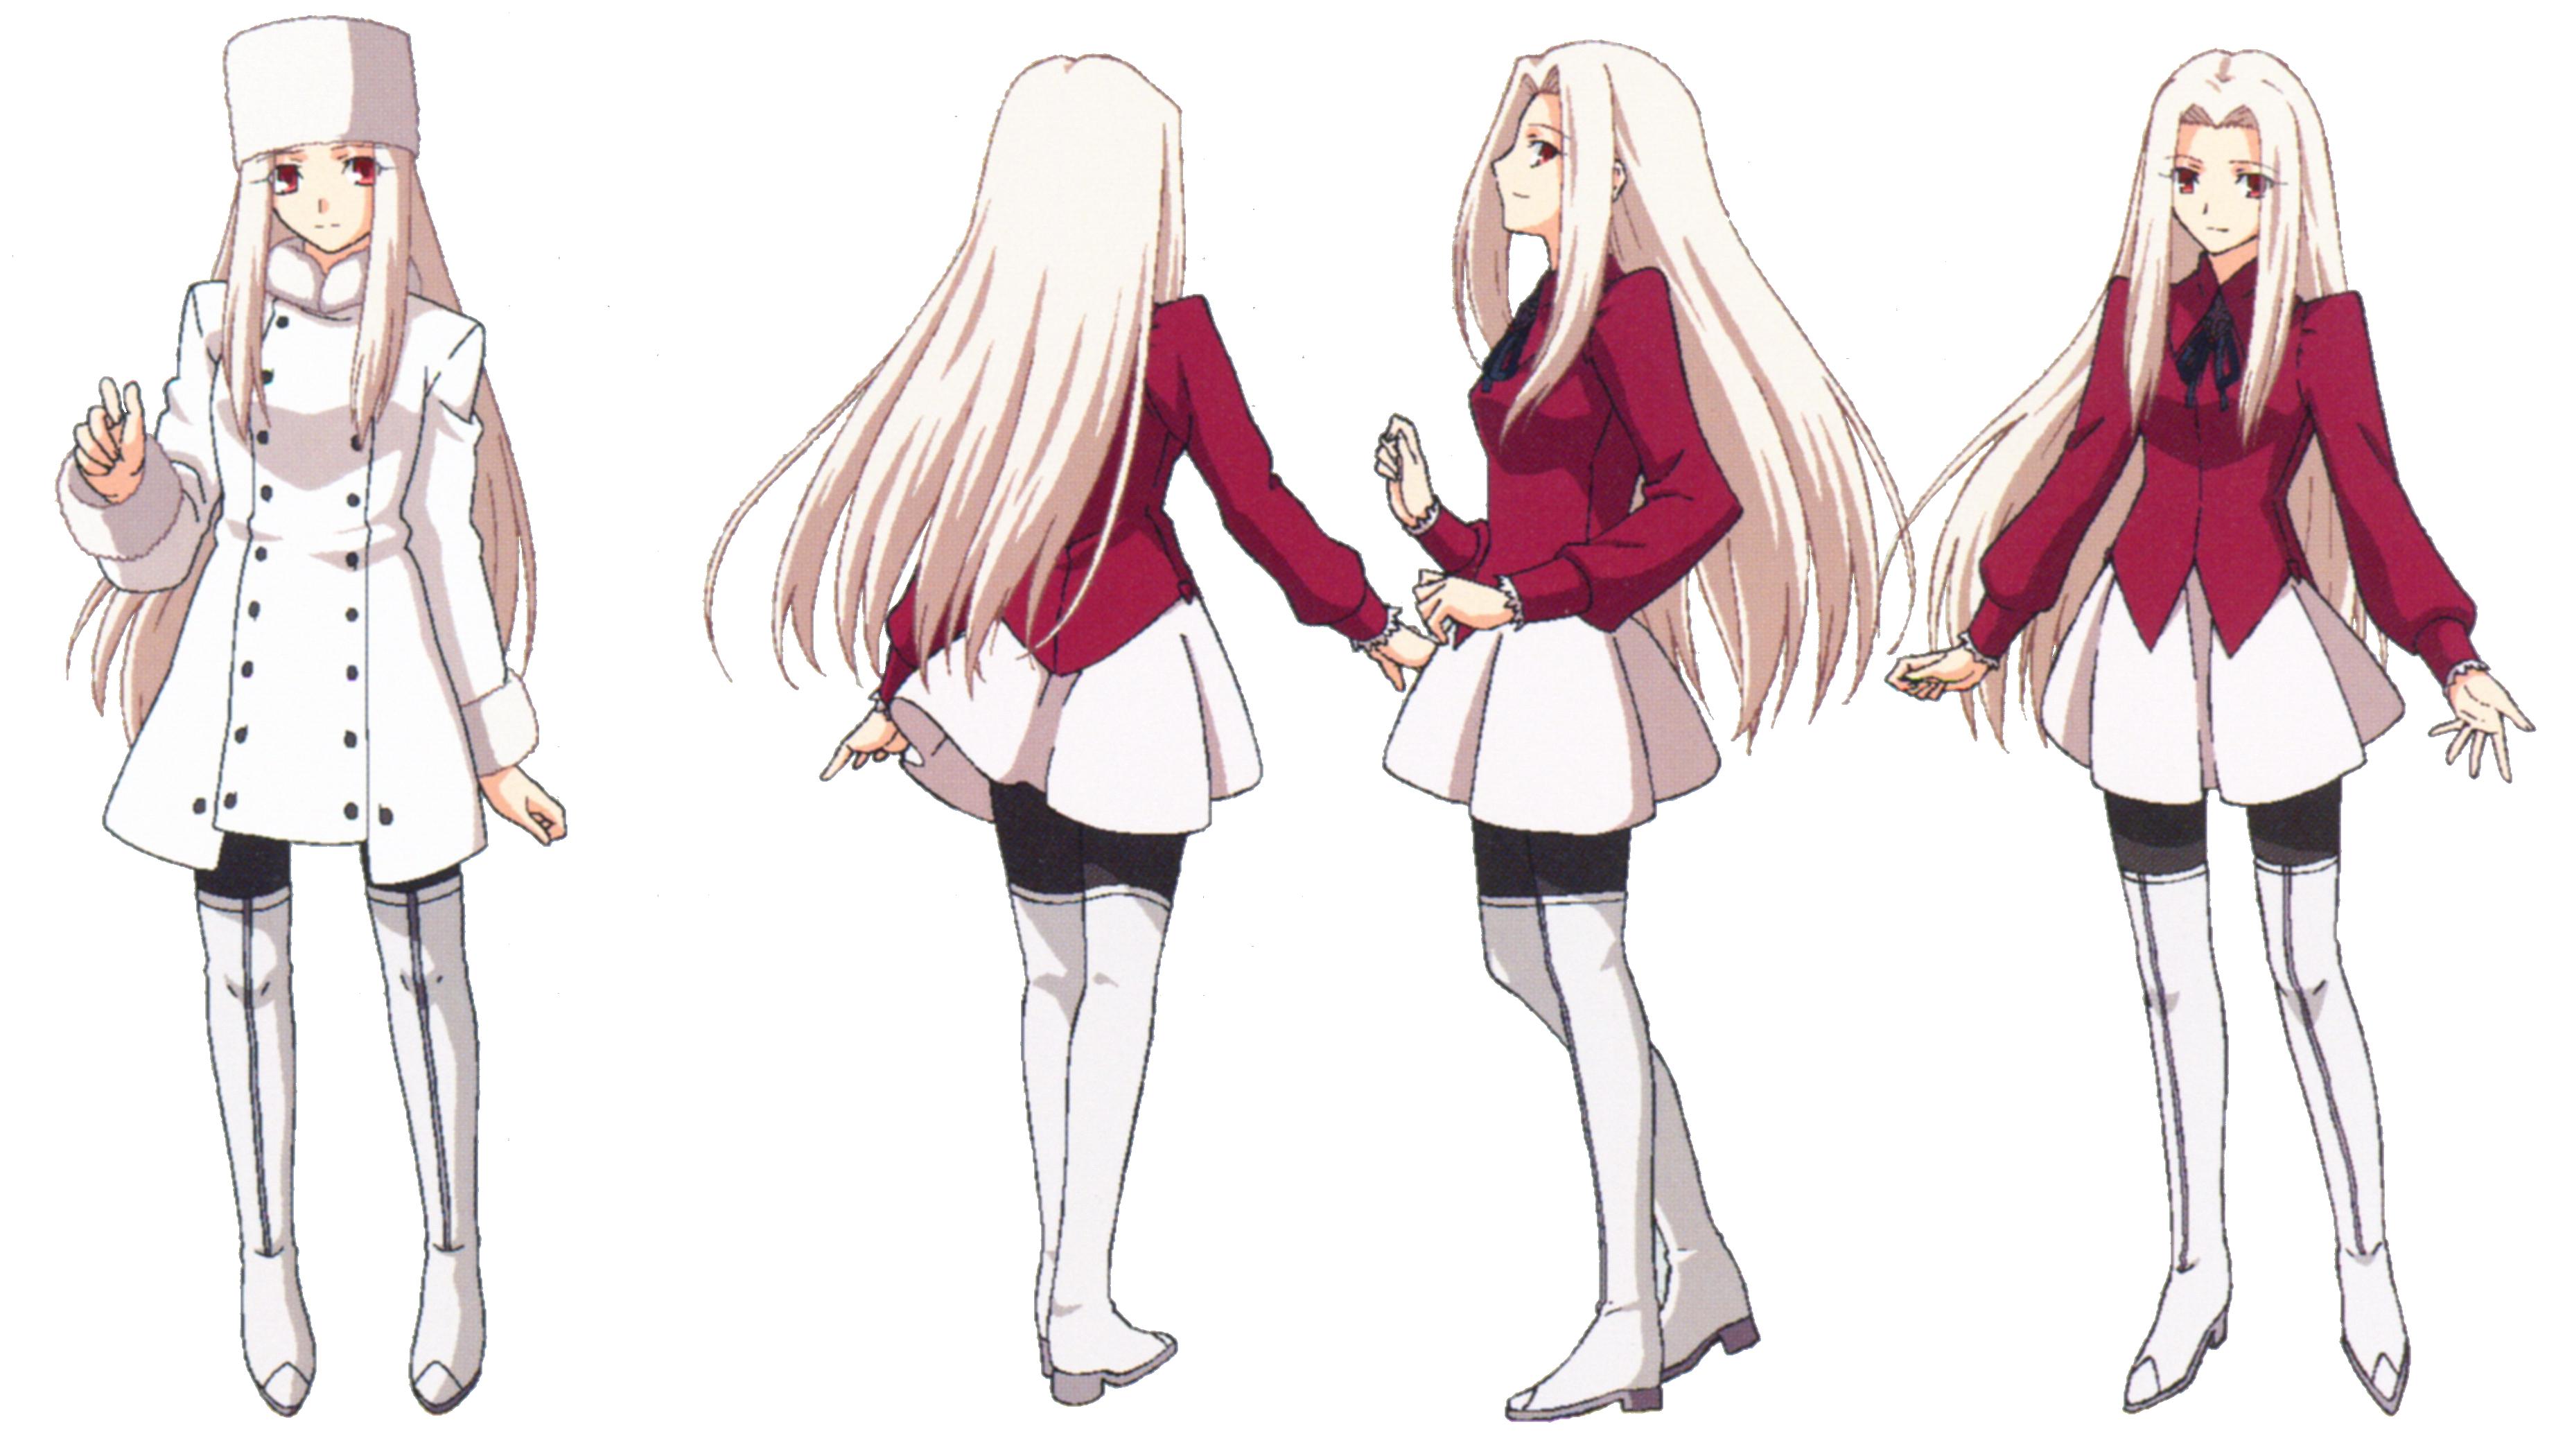 Archivo:Iri ufotable Fate Zero Character Sheet 2.png